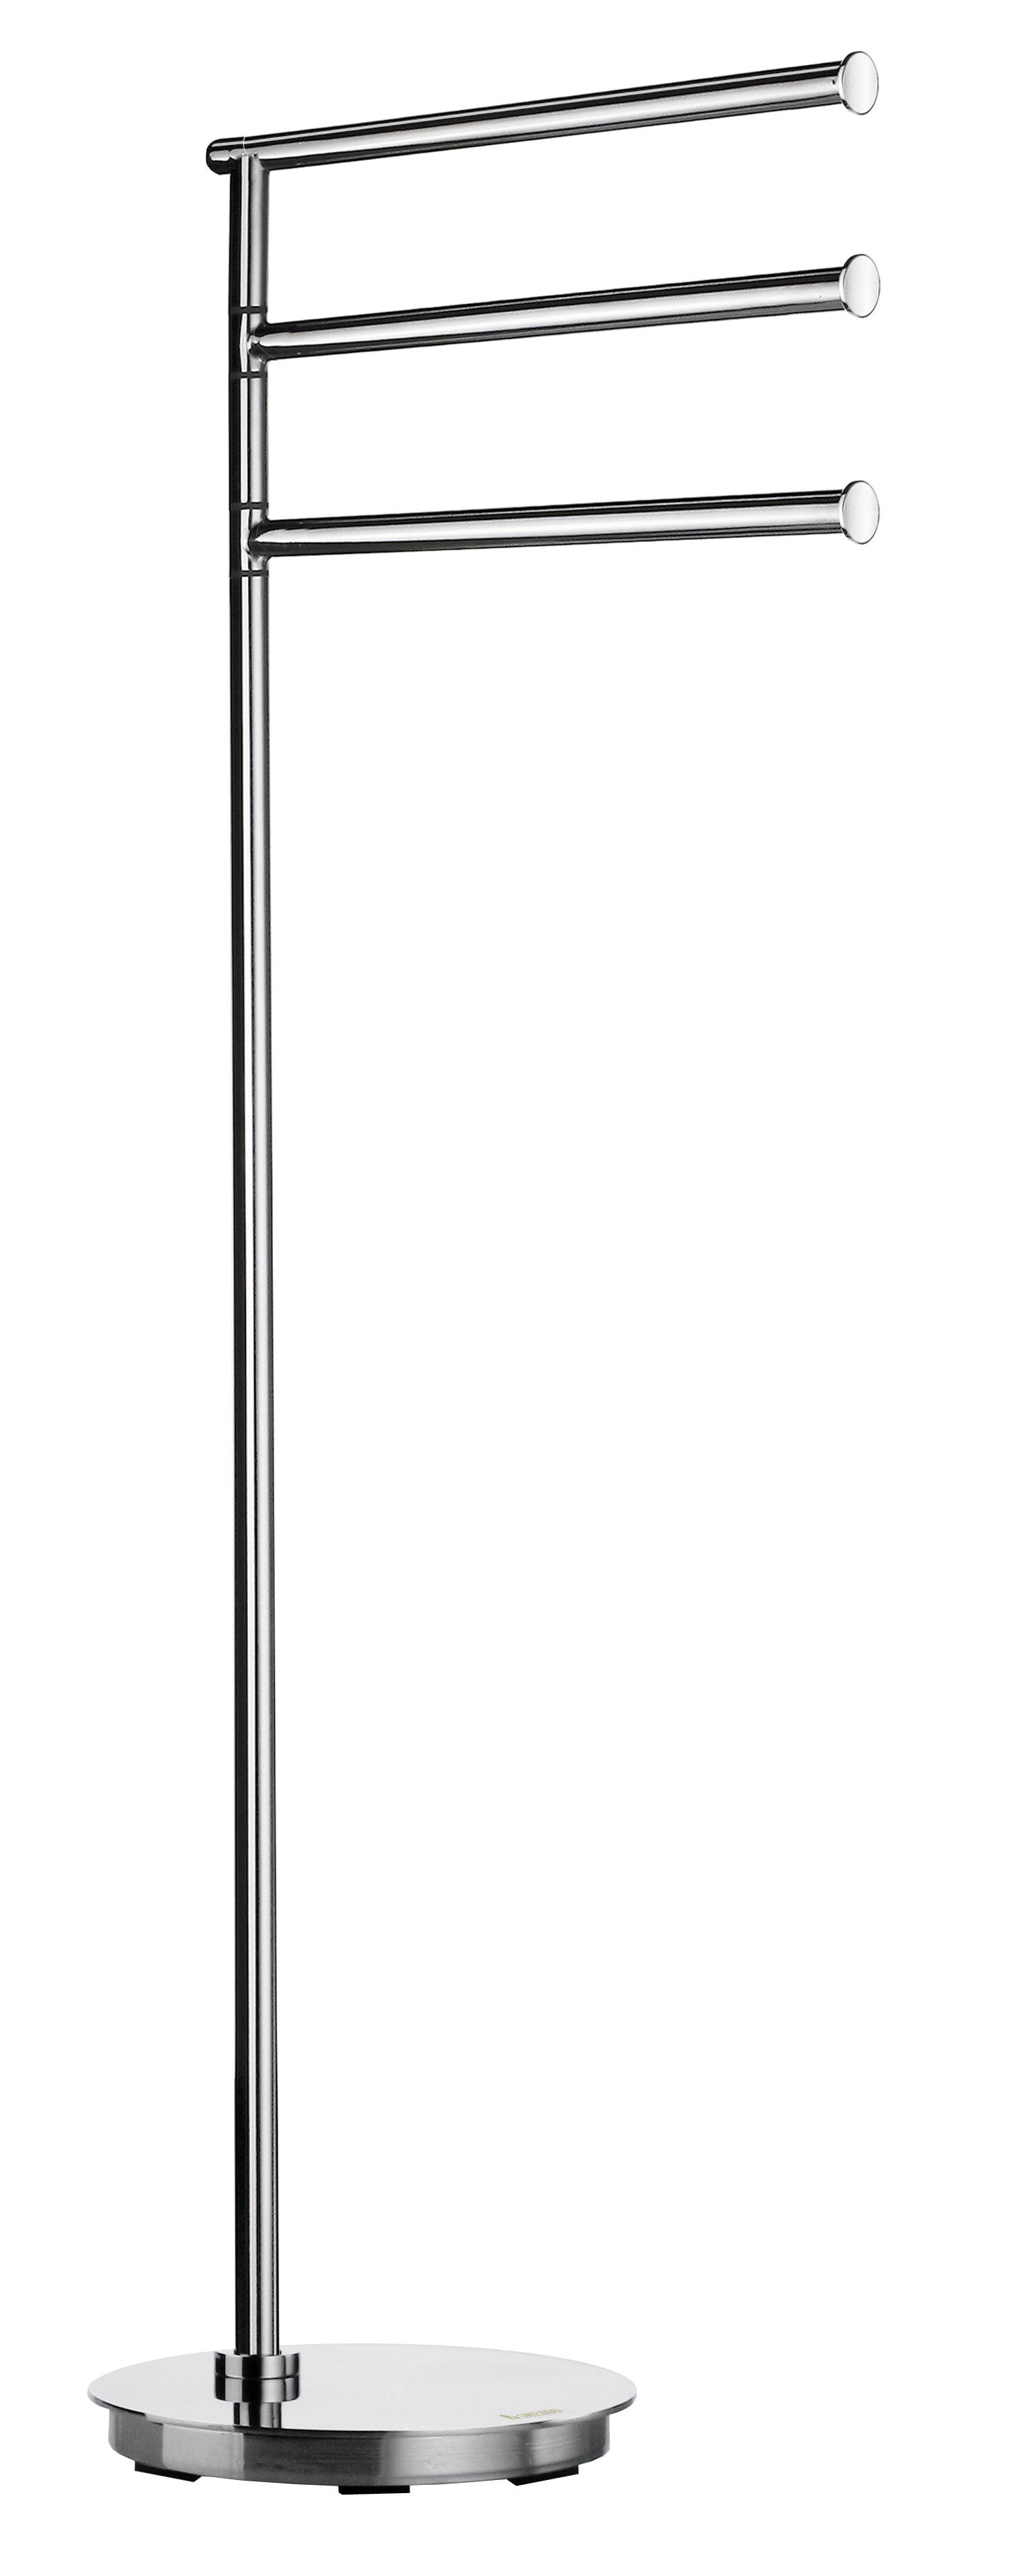 SMEDBO Outline Lite Badetuchhalter, rund